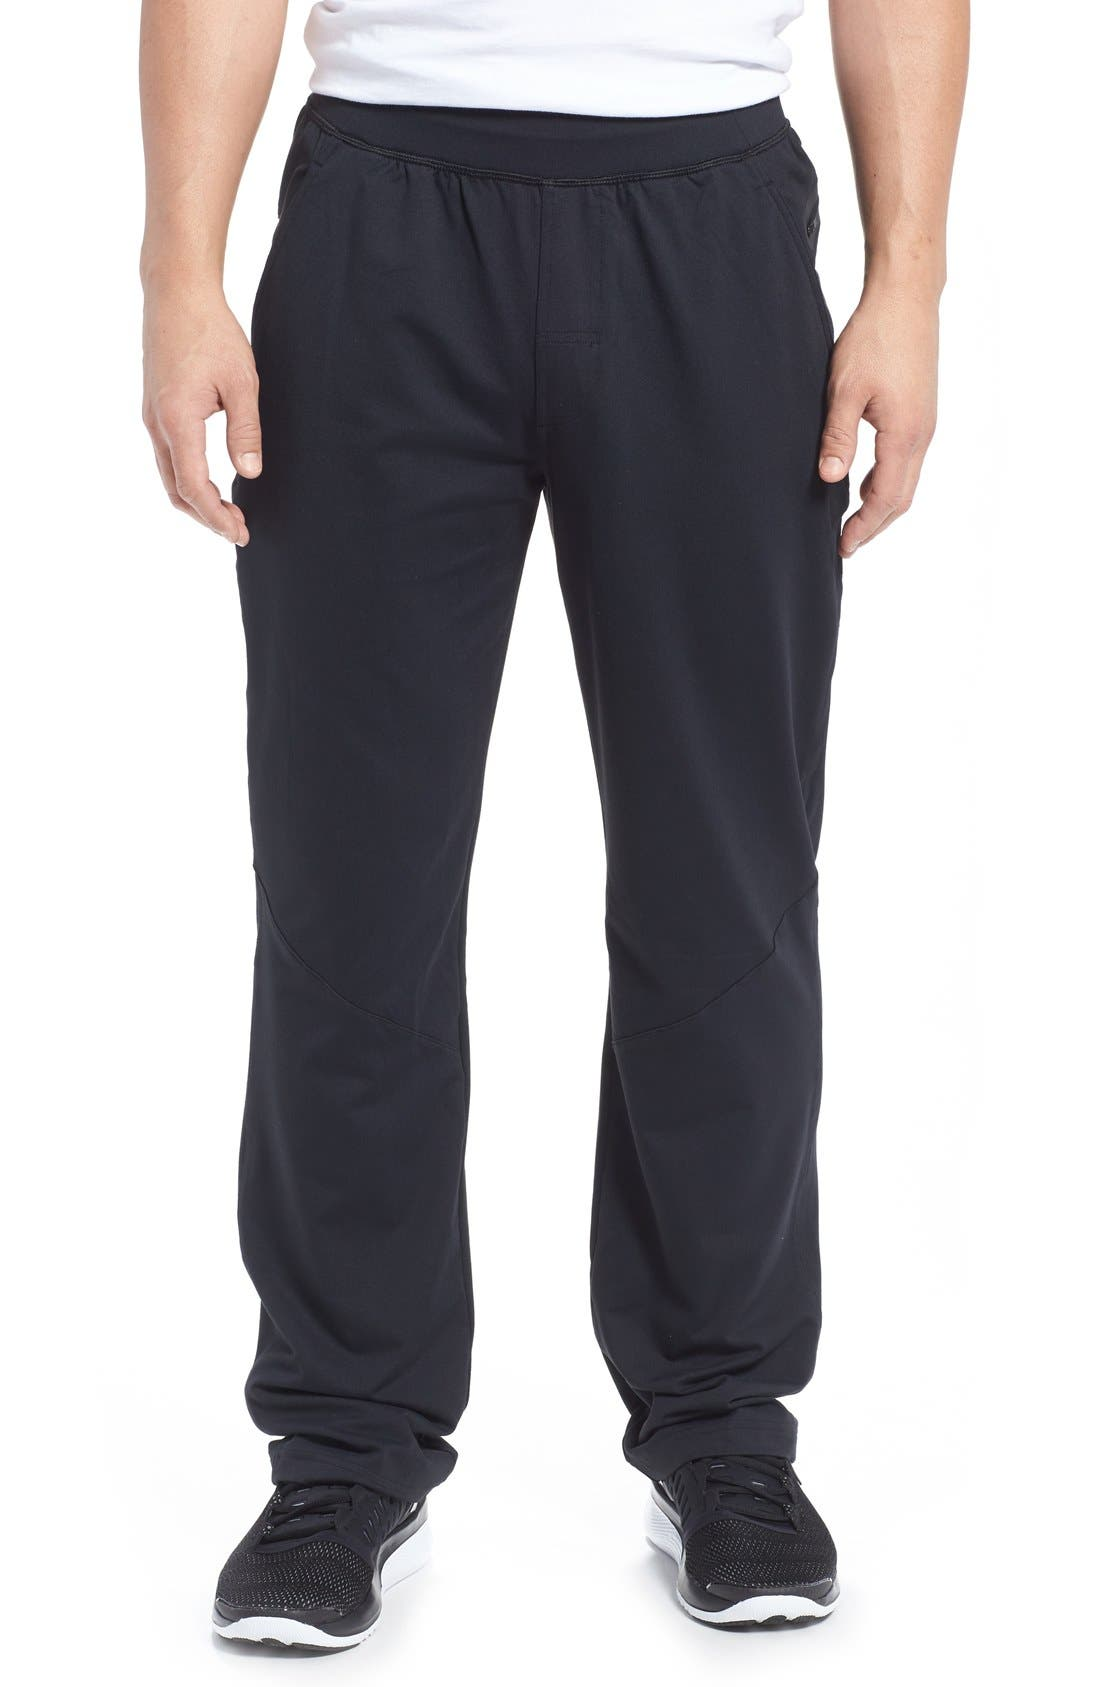 Main Image - Under Armour Regular Fit Knit Training Pants